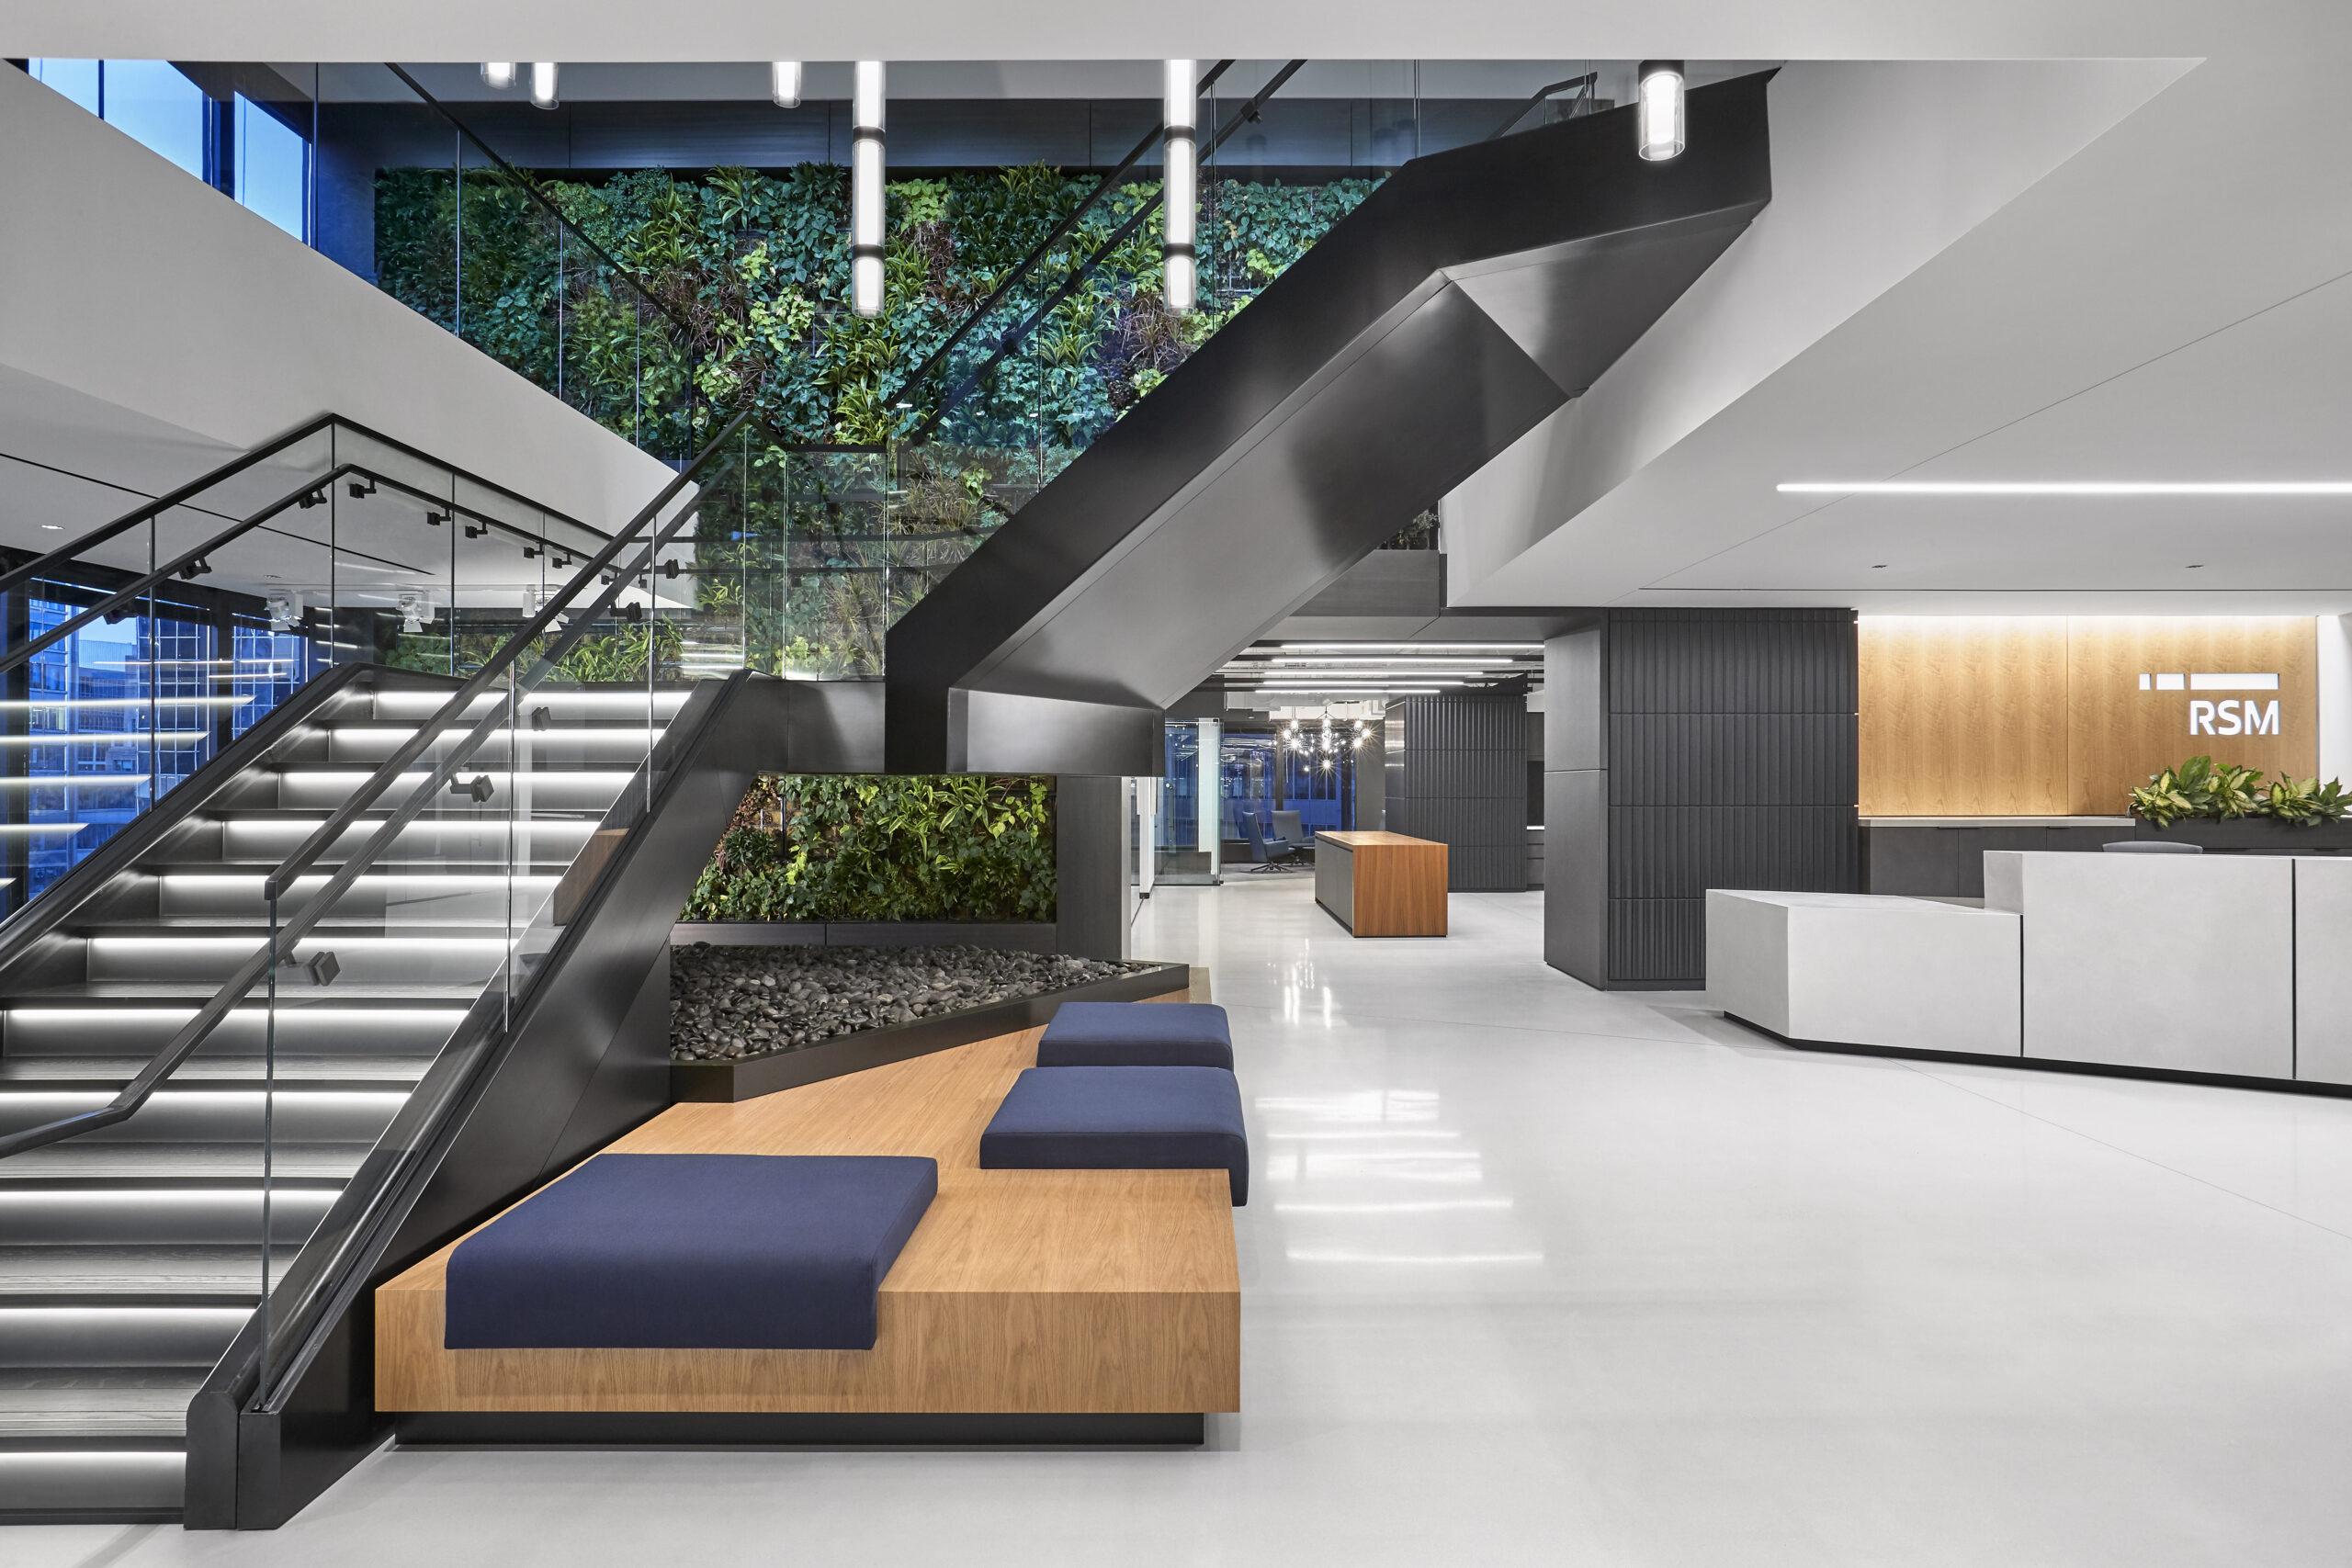 RSM Corporate Headquarters